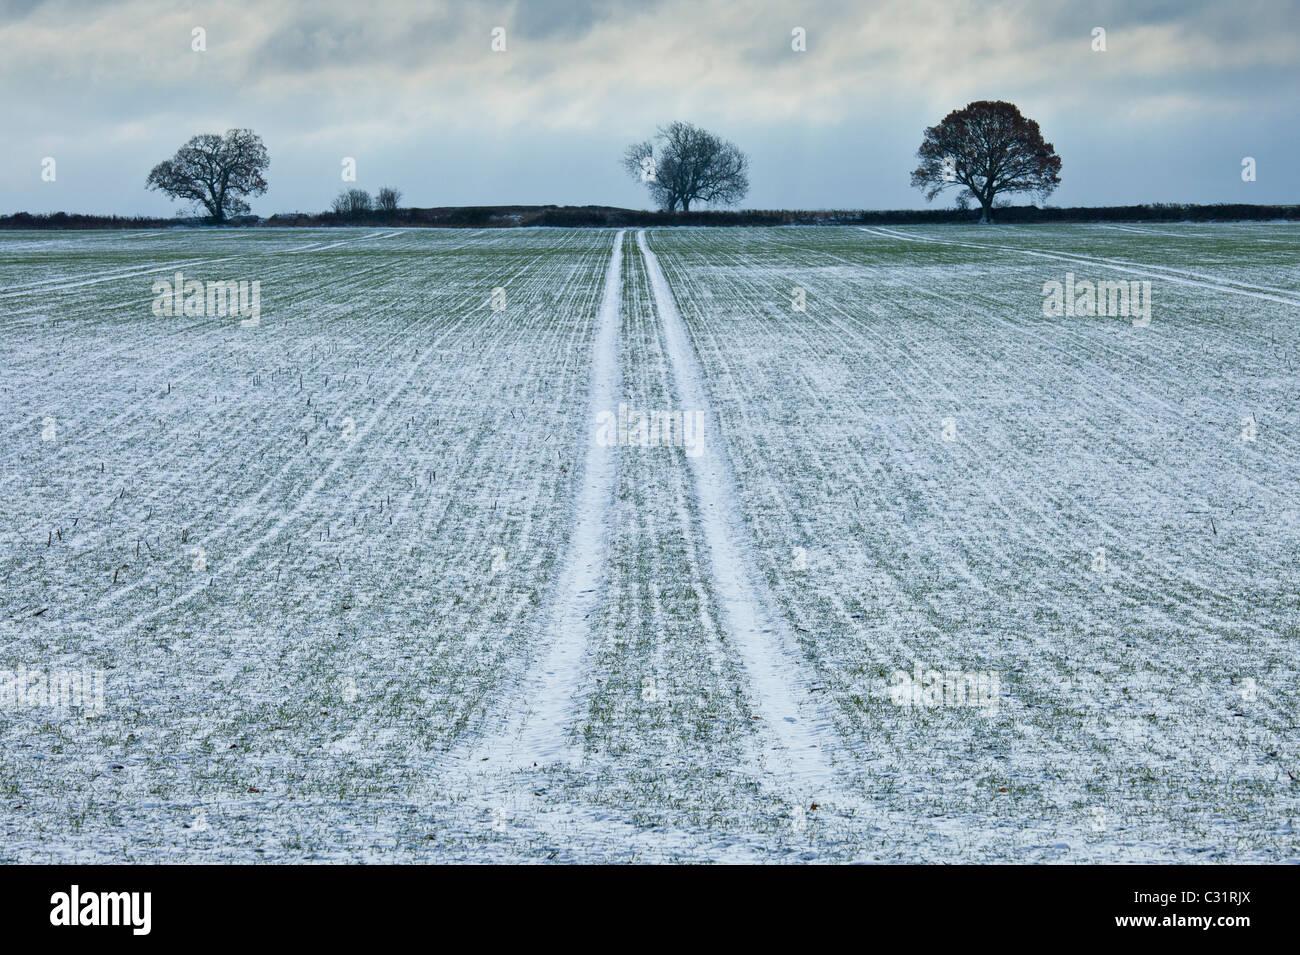 Frostigen Szene Feld und Bäume bei Raureif im Winter, The Cotswolds UK Stockbild